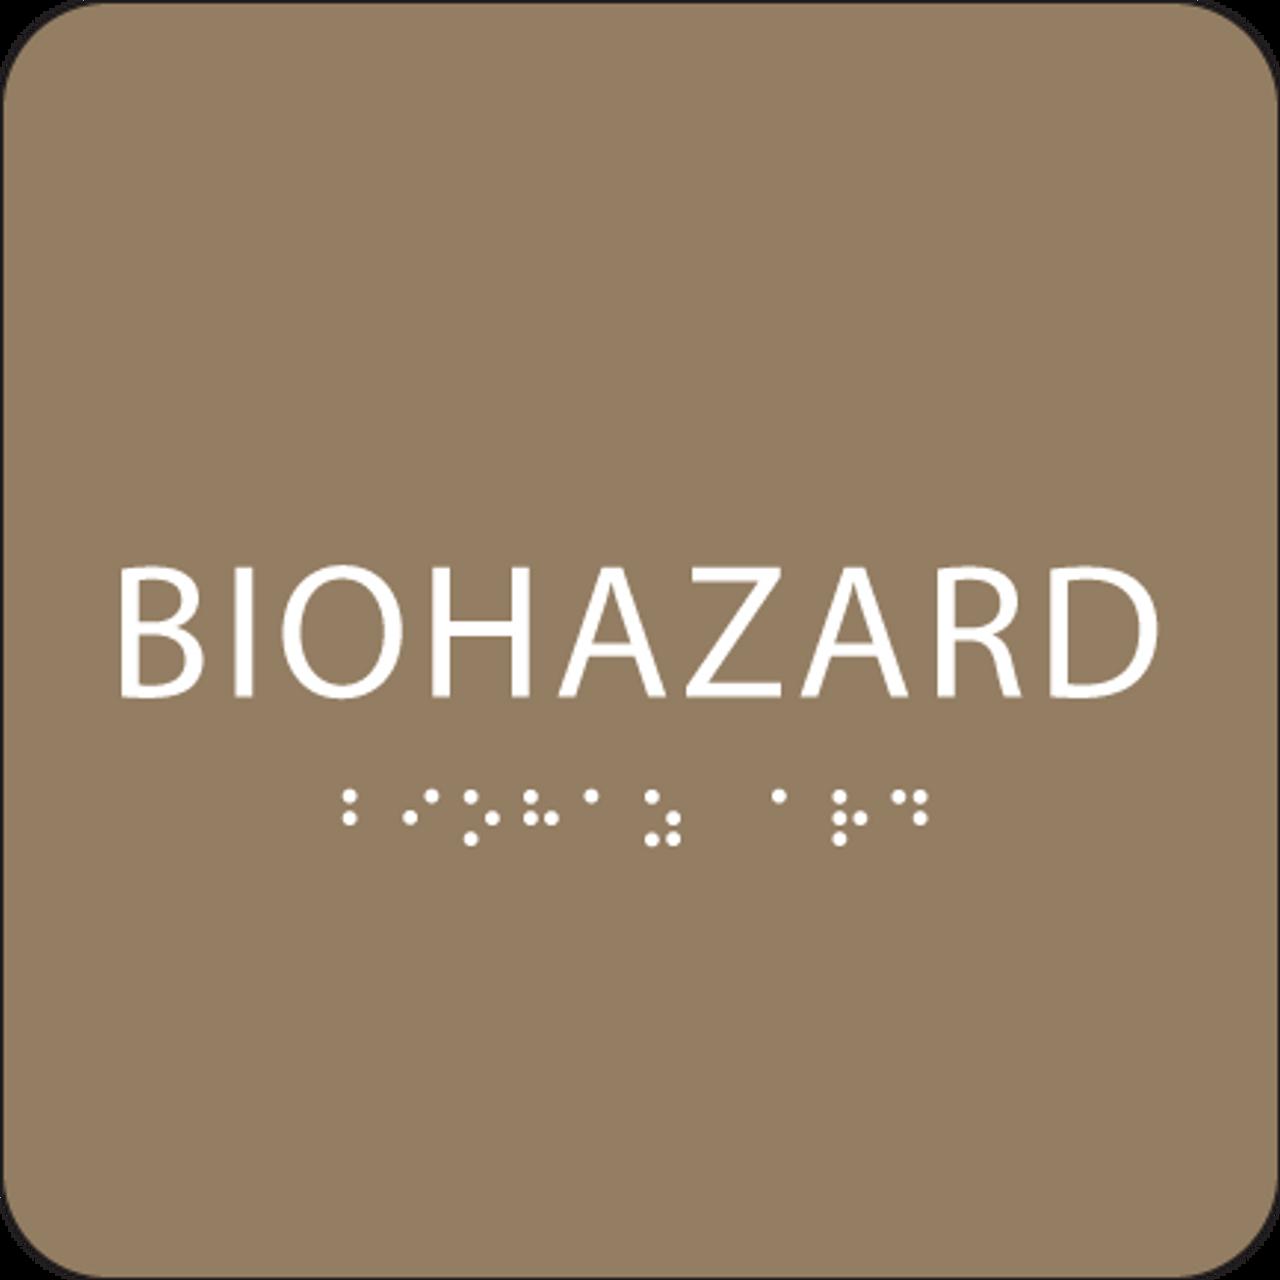 Brown Biohazard ADA Sign